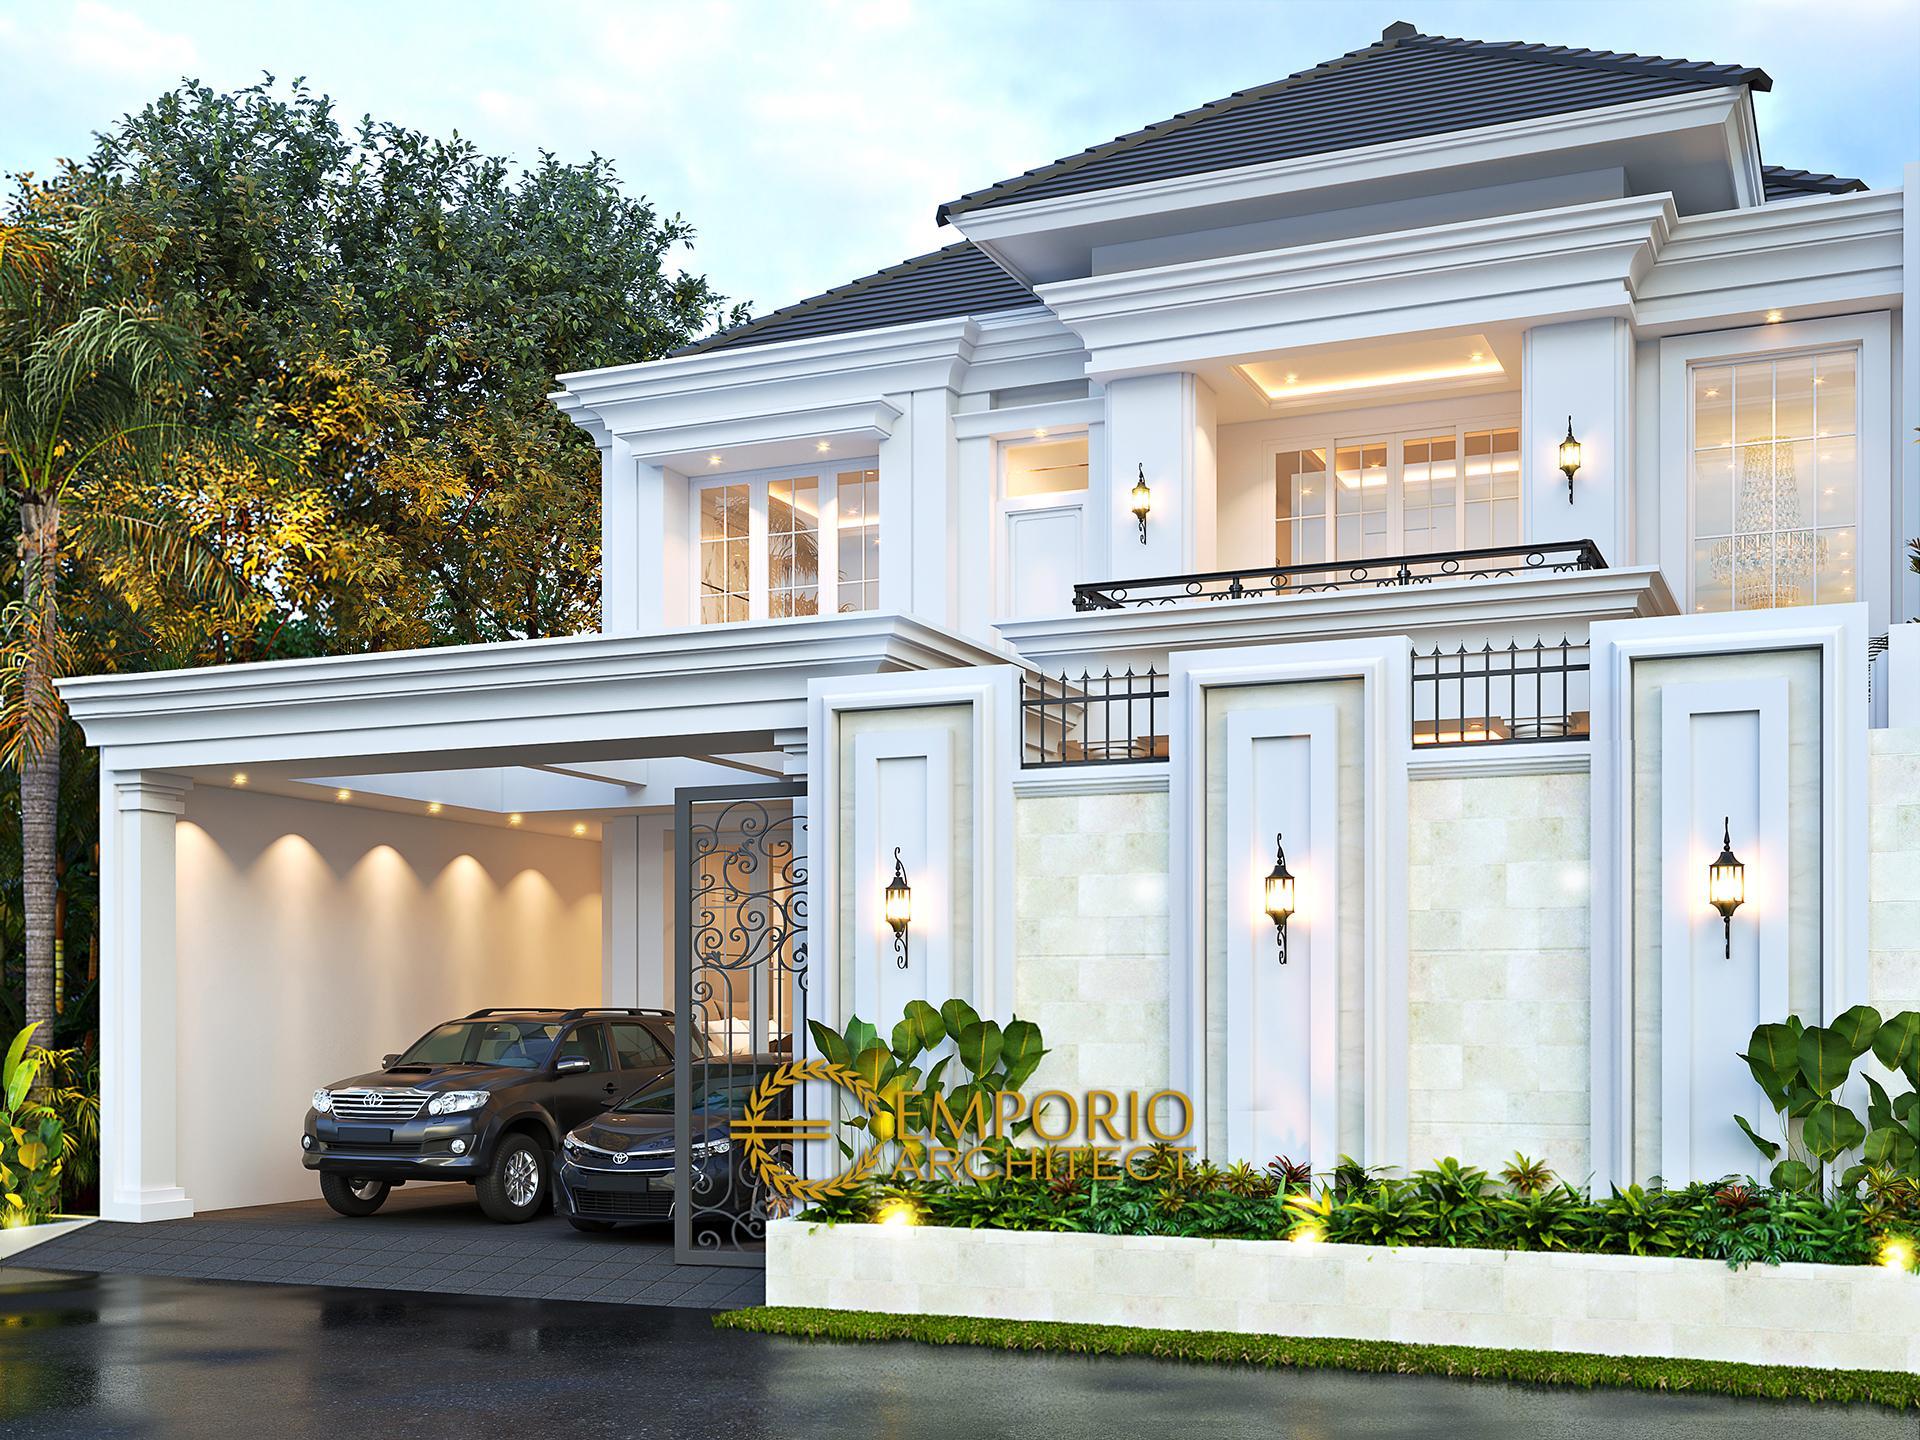 50 Gambar Pagar Rumah 2 Lantai Terbaru Lingkar Png